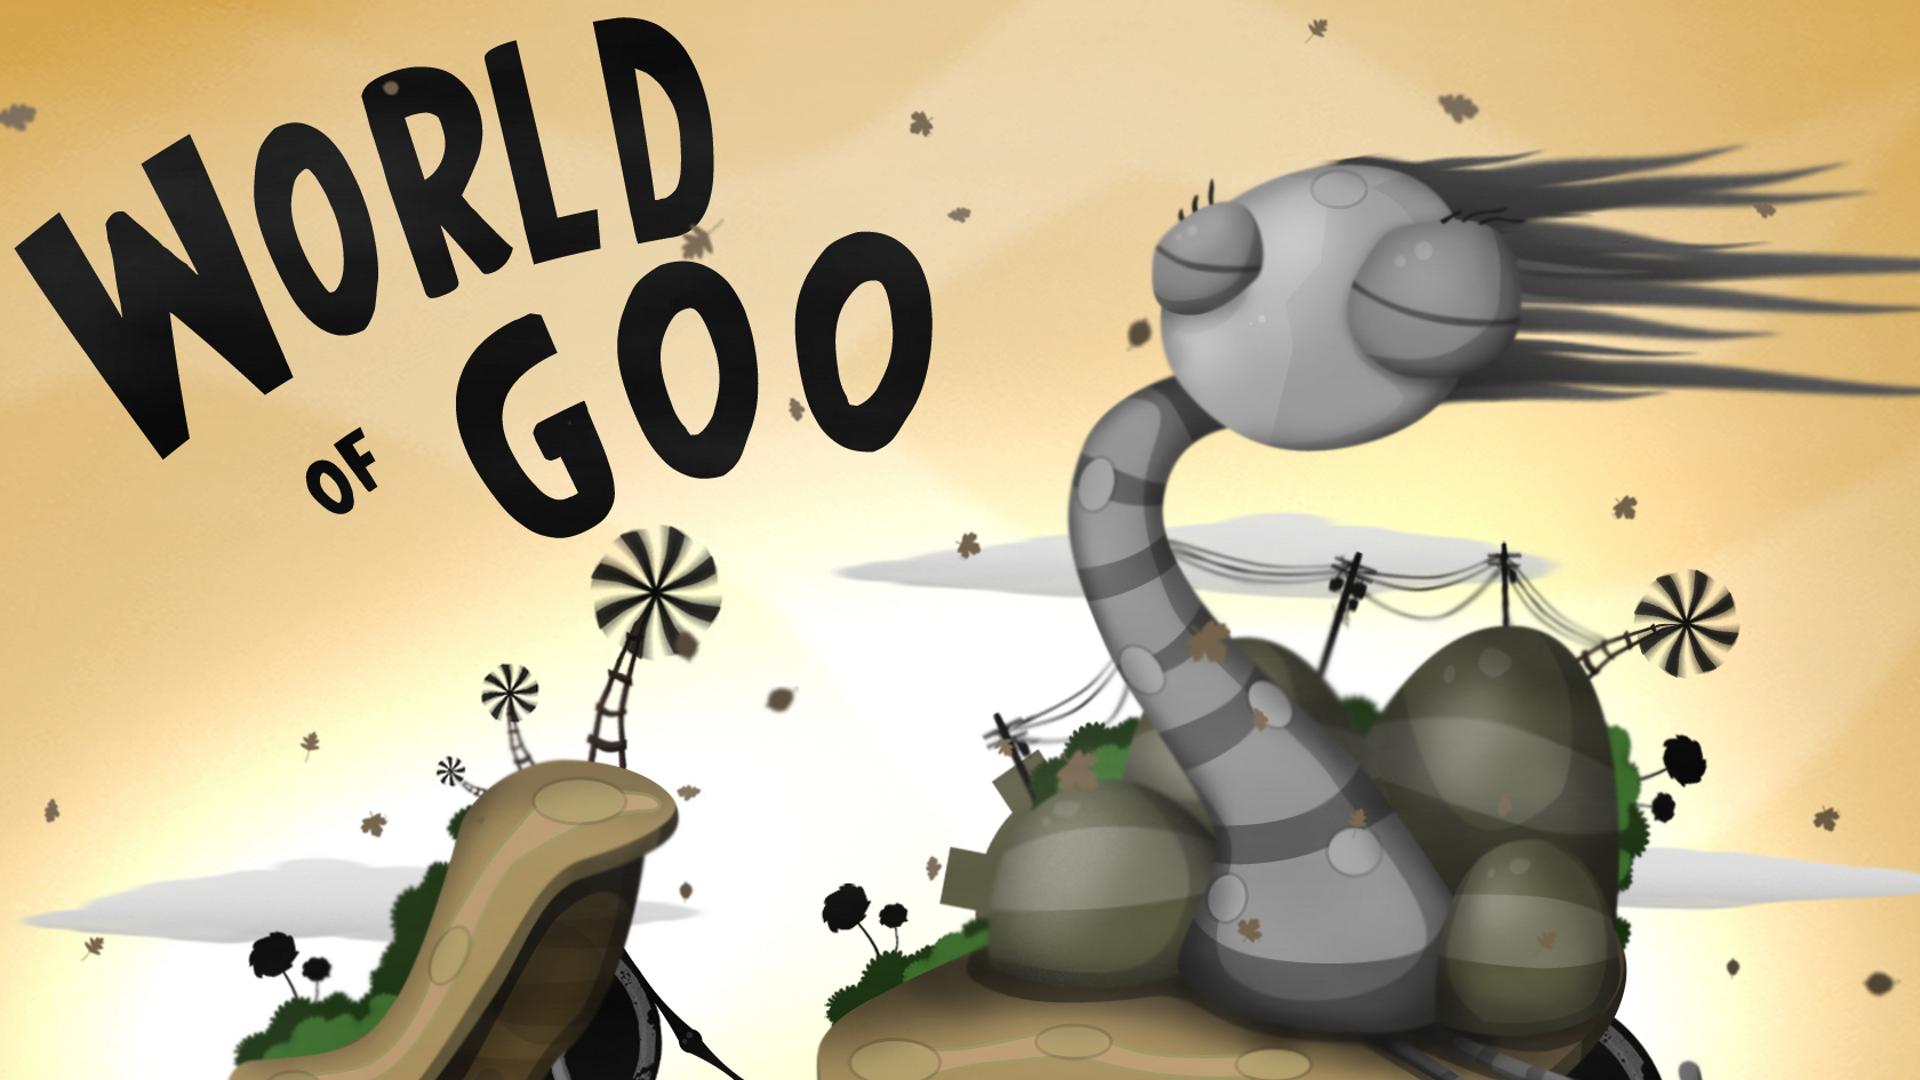 World Of Goo Wallpaper - World Of Goo Wallpaper